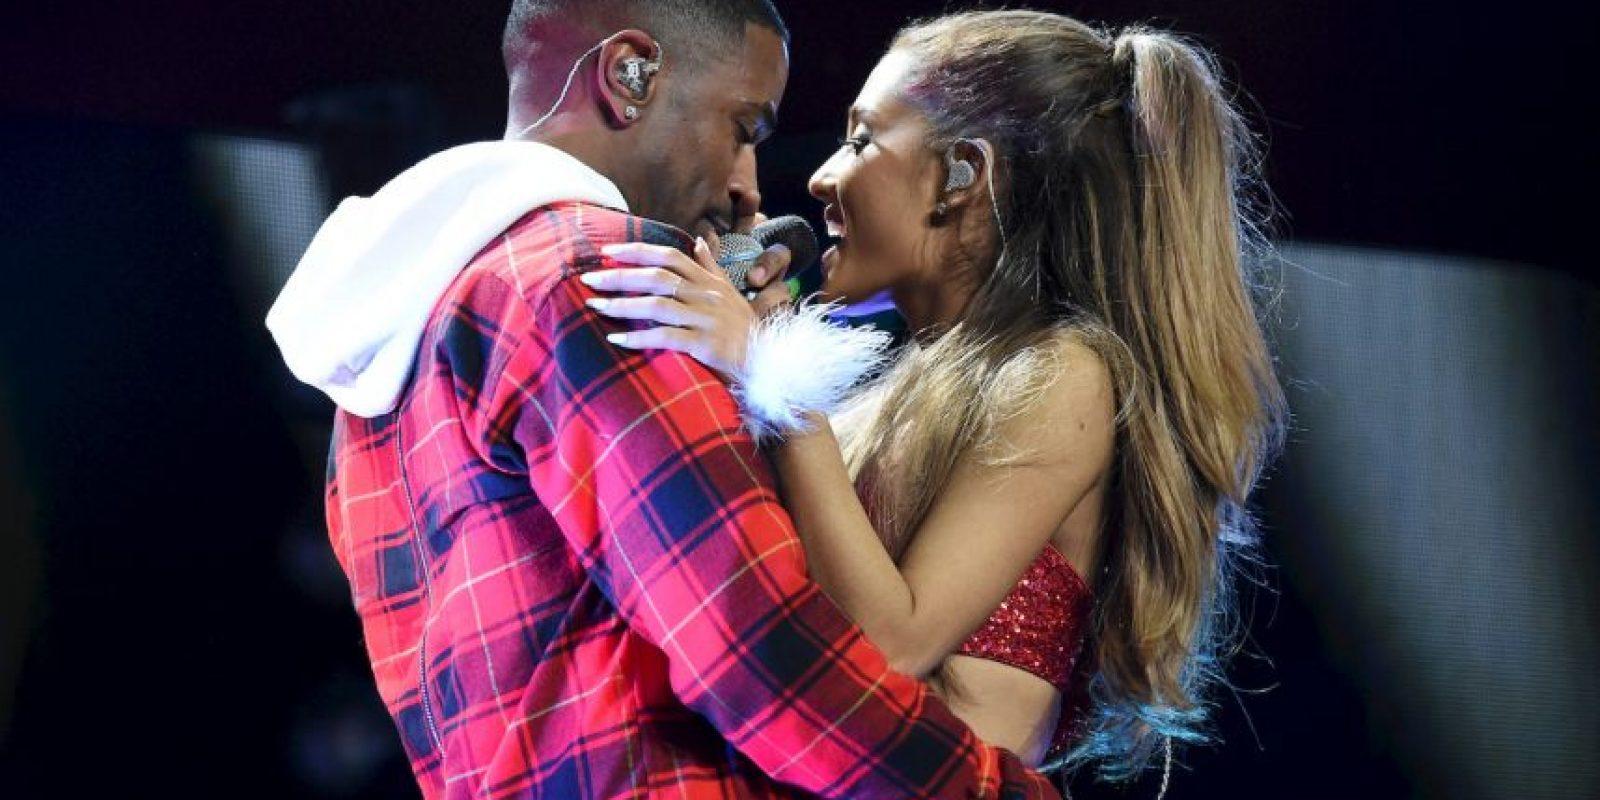 Ariana Grande esta muy contenta con su novio. Foto:Getty